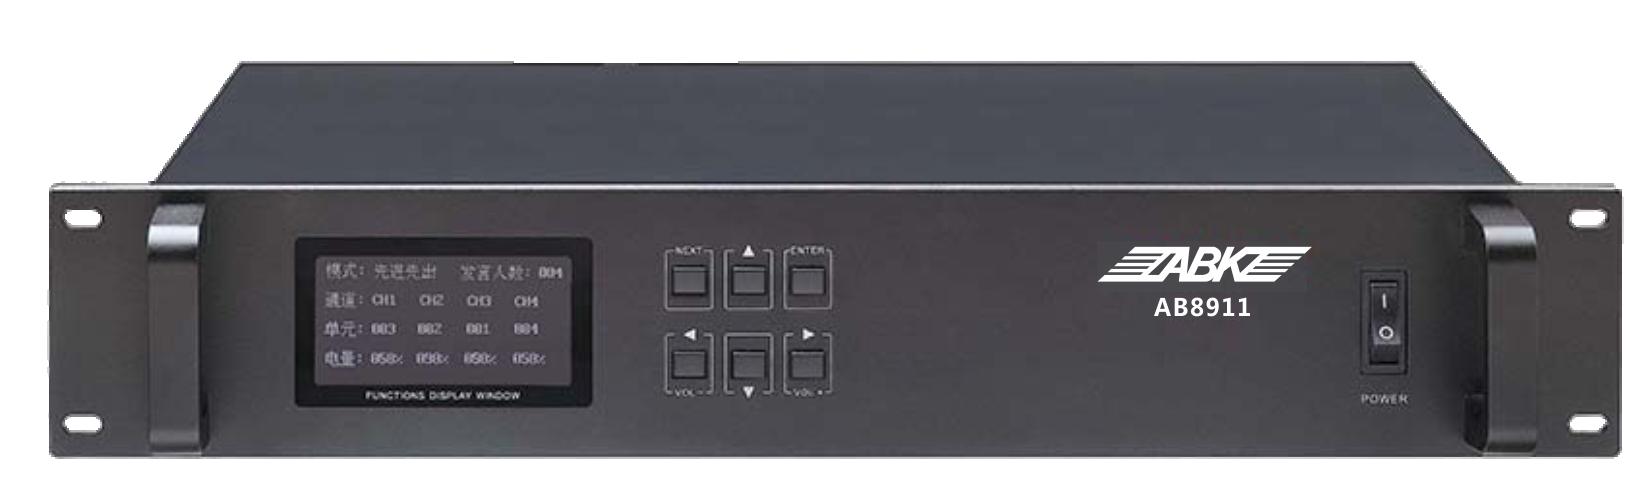 AB8911无线欧宝体肓登录控制主机